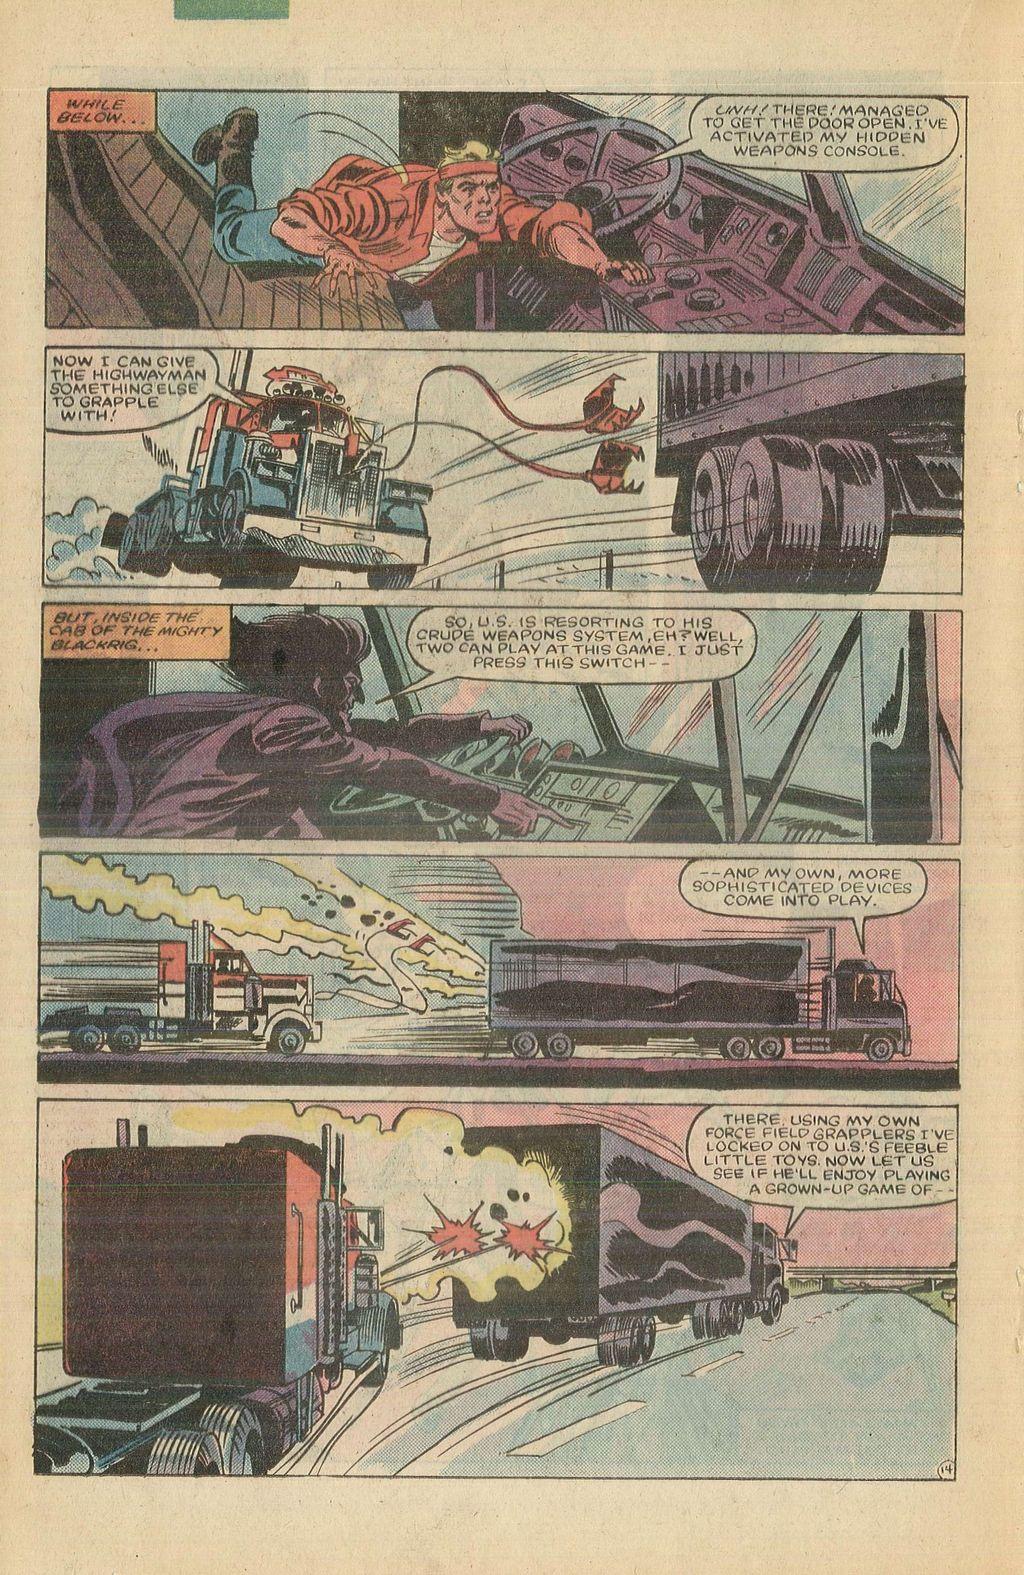 Read online U.S. 1 comic -  Issue #10 - 20